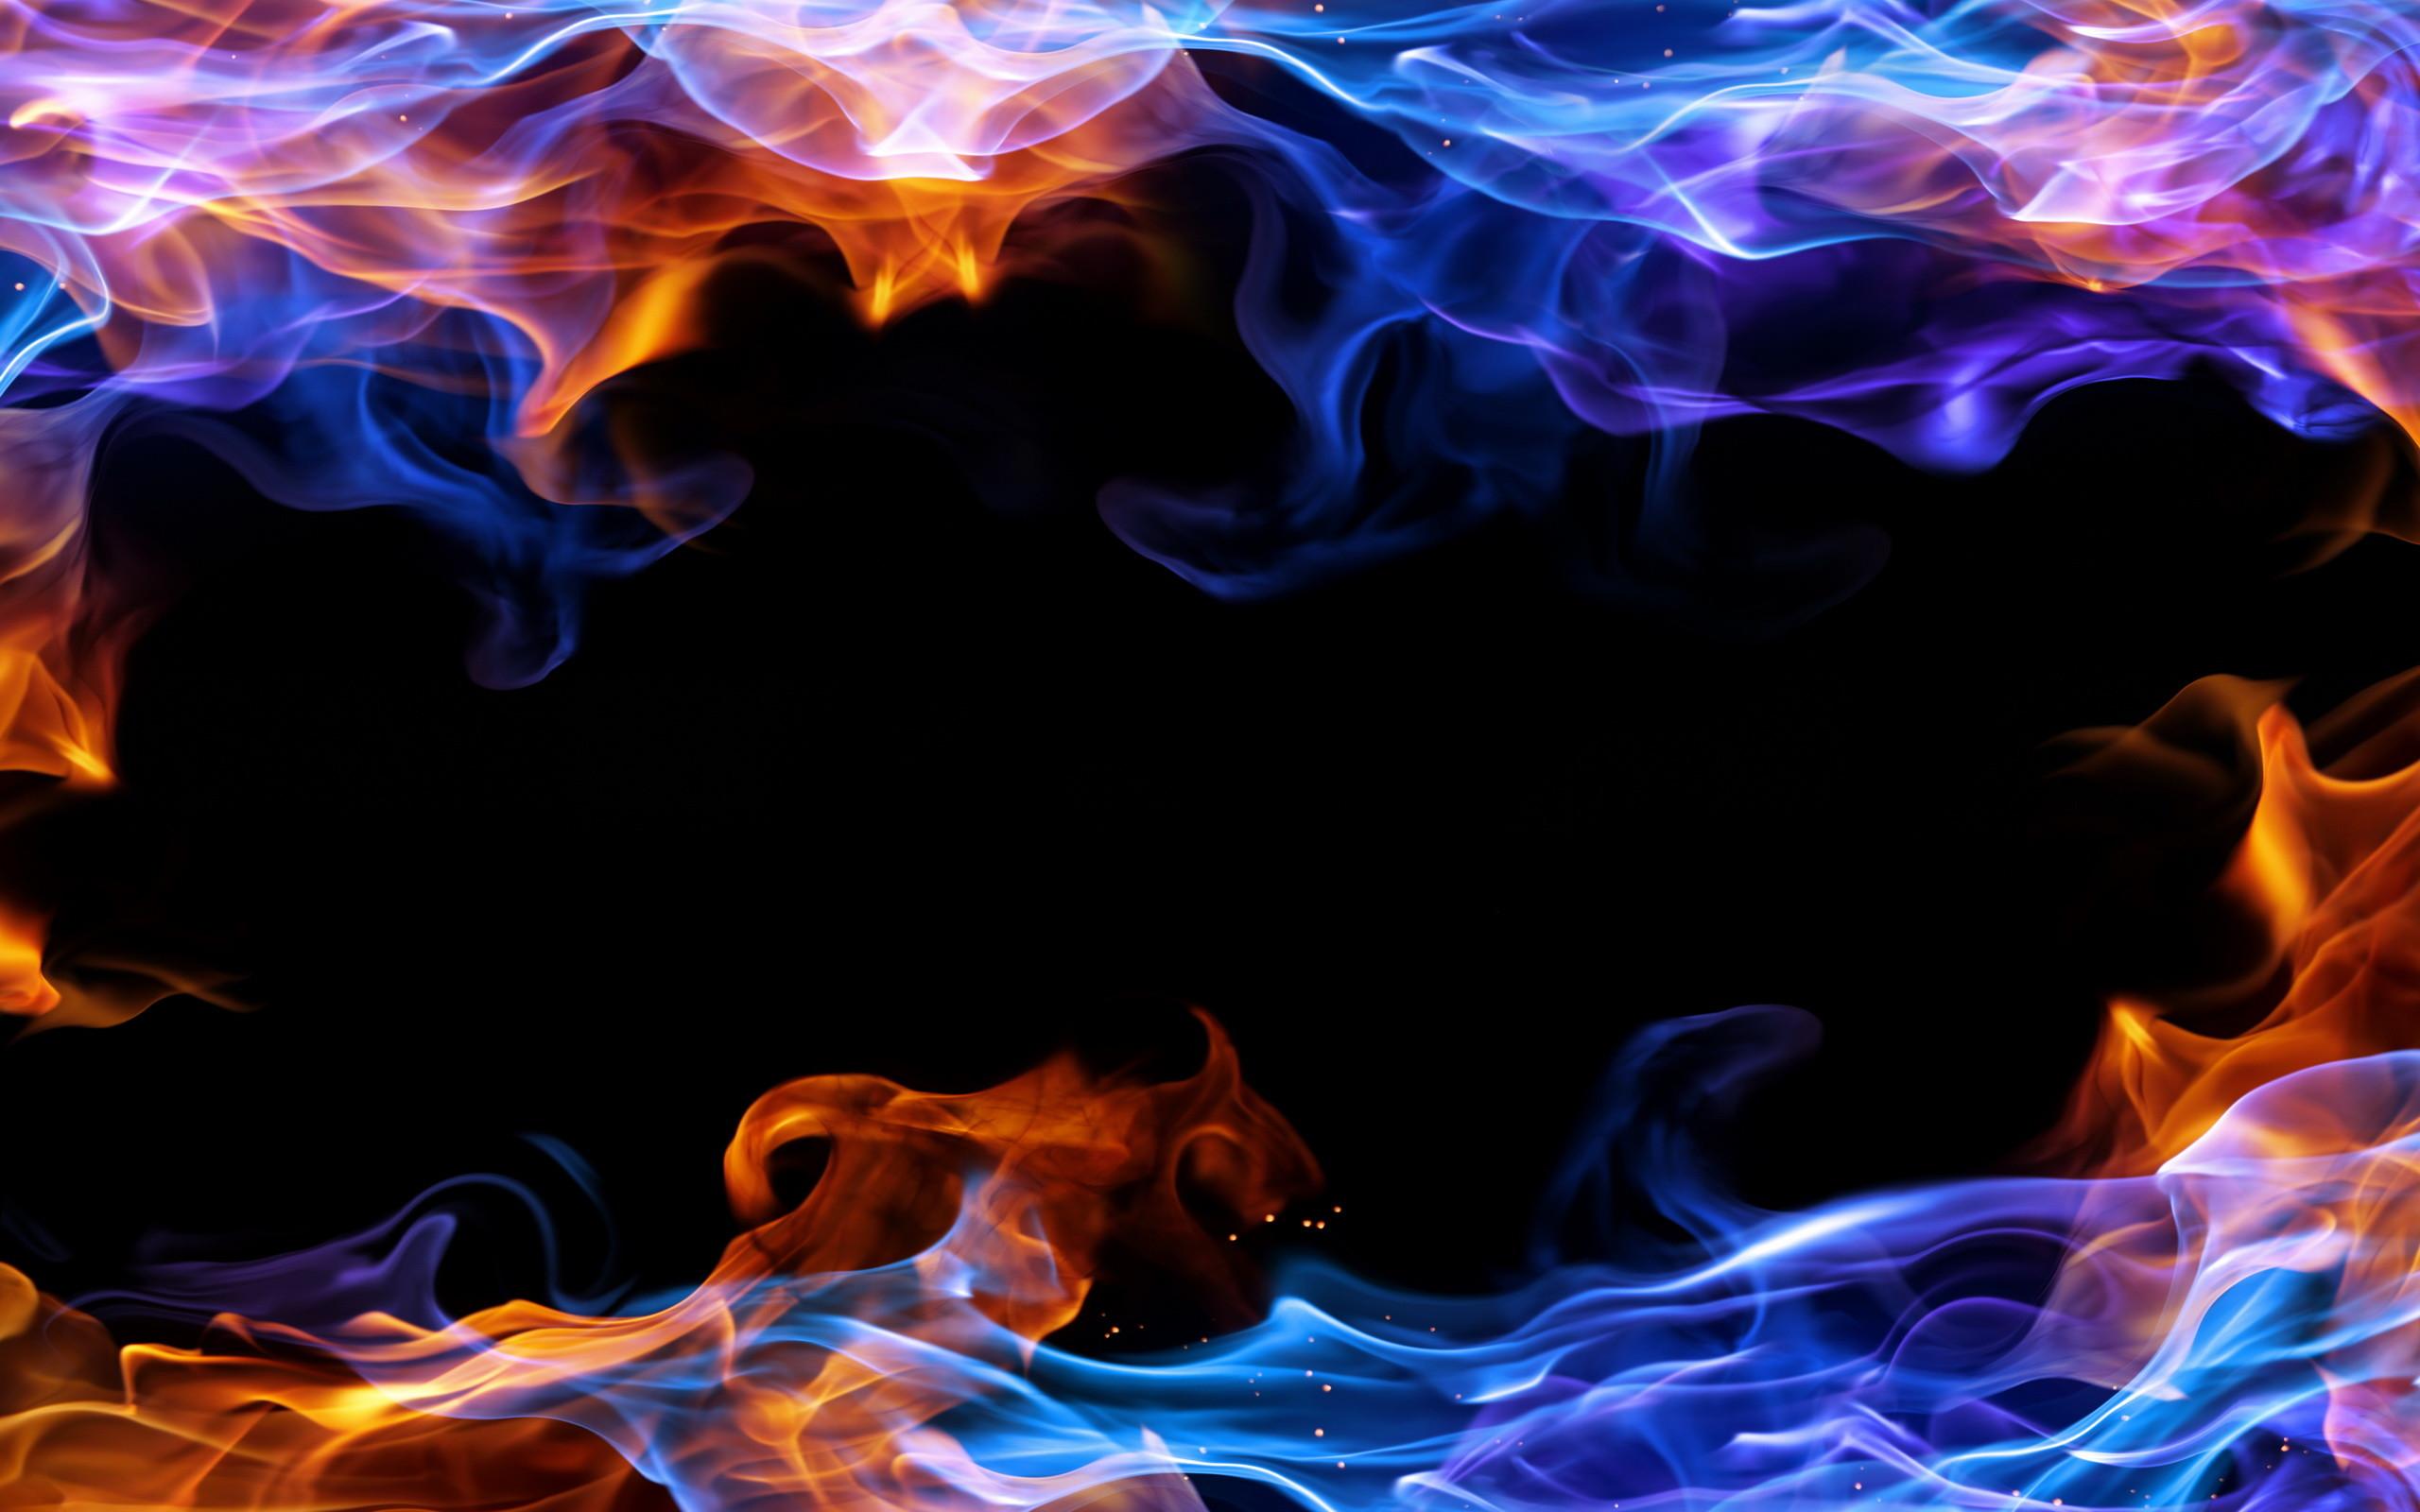 Blue Fire Wallpaper HD (70+ Images